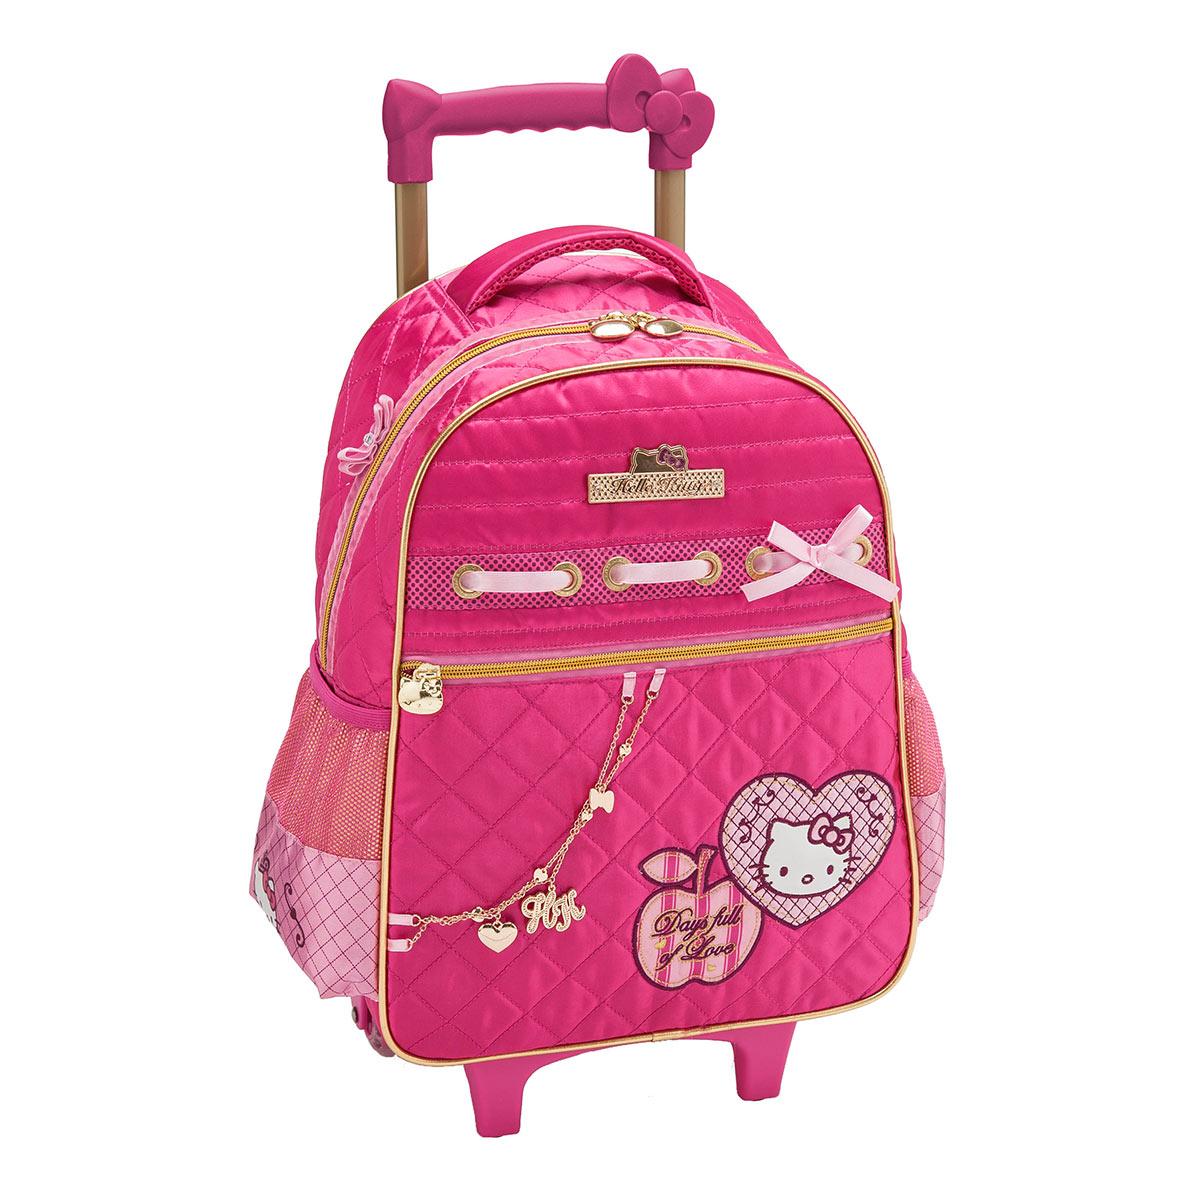 Mochilete Grande Hello Kitty Precious 924K01